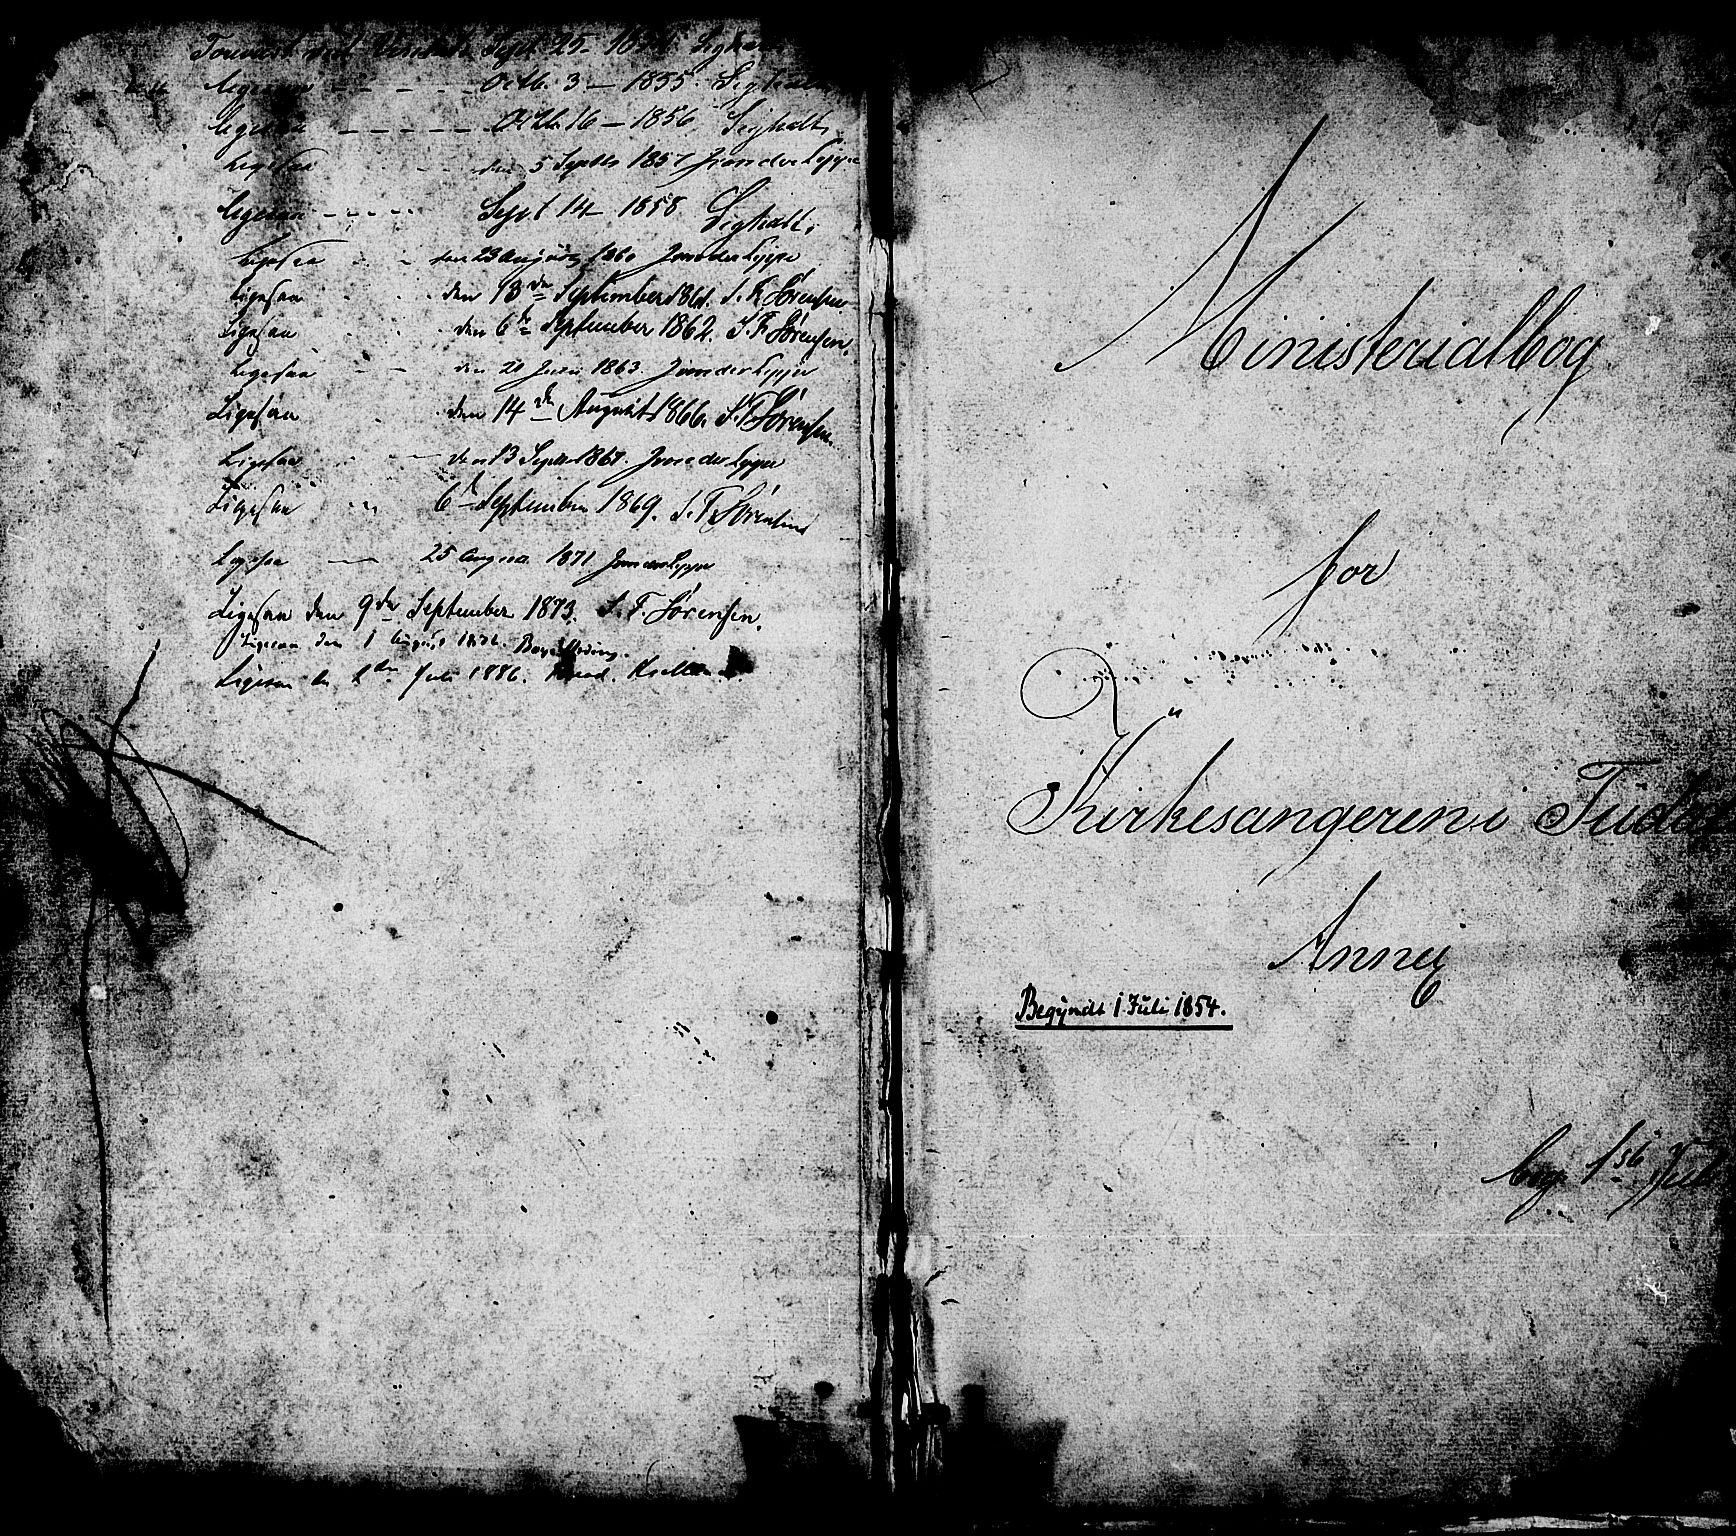 SAKO, Hjartdal kirkebøker, G/Gc/L0002: Klokkerbok nr. III 2, 1854-1890